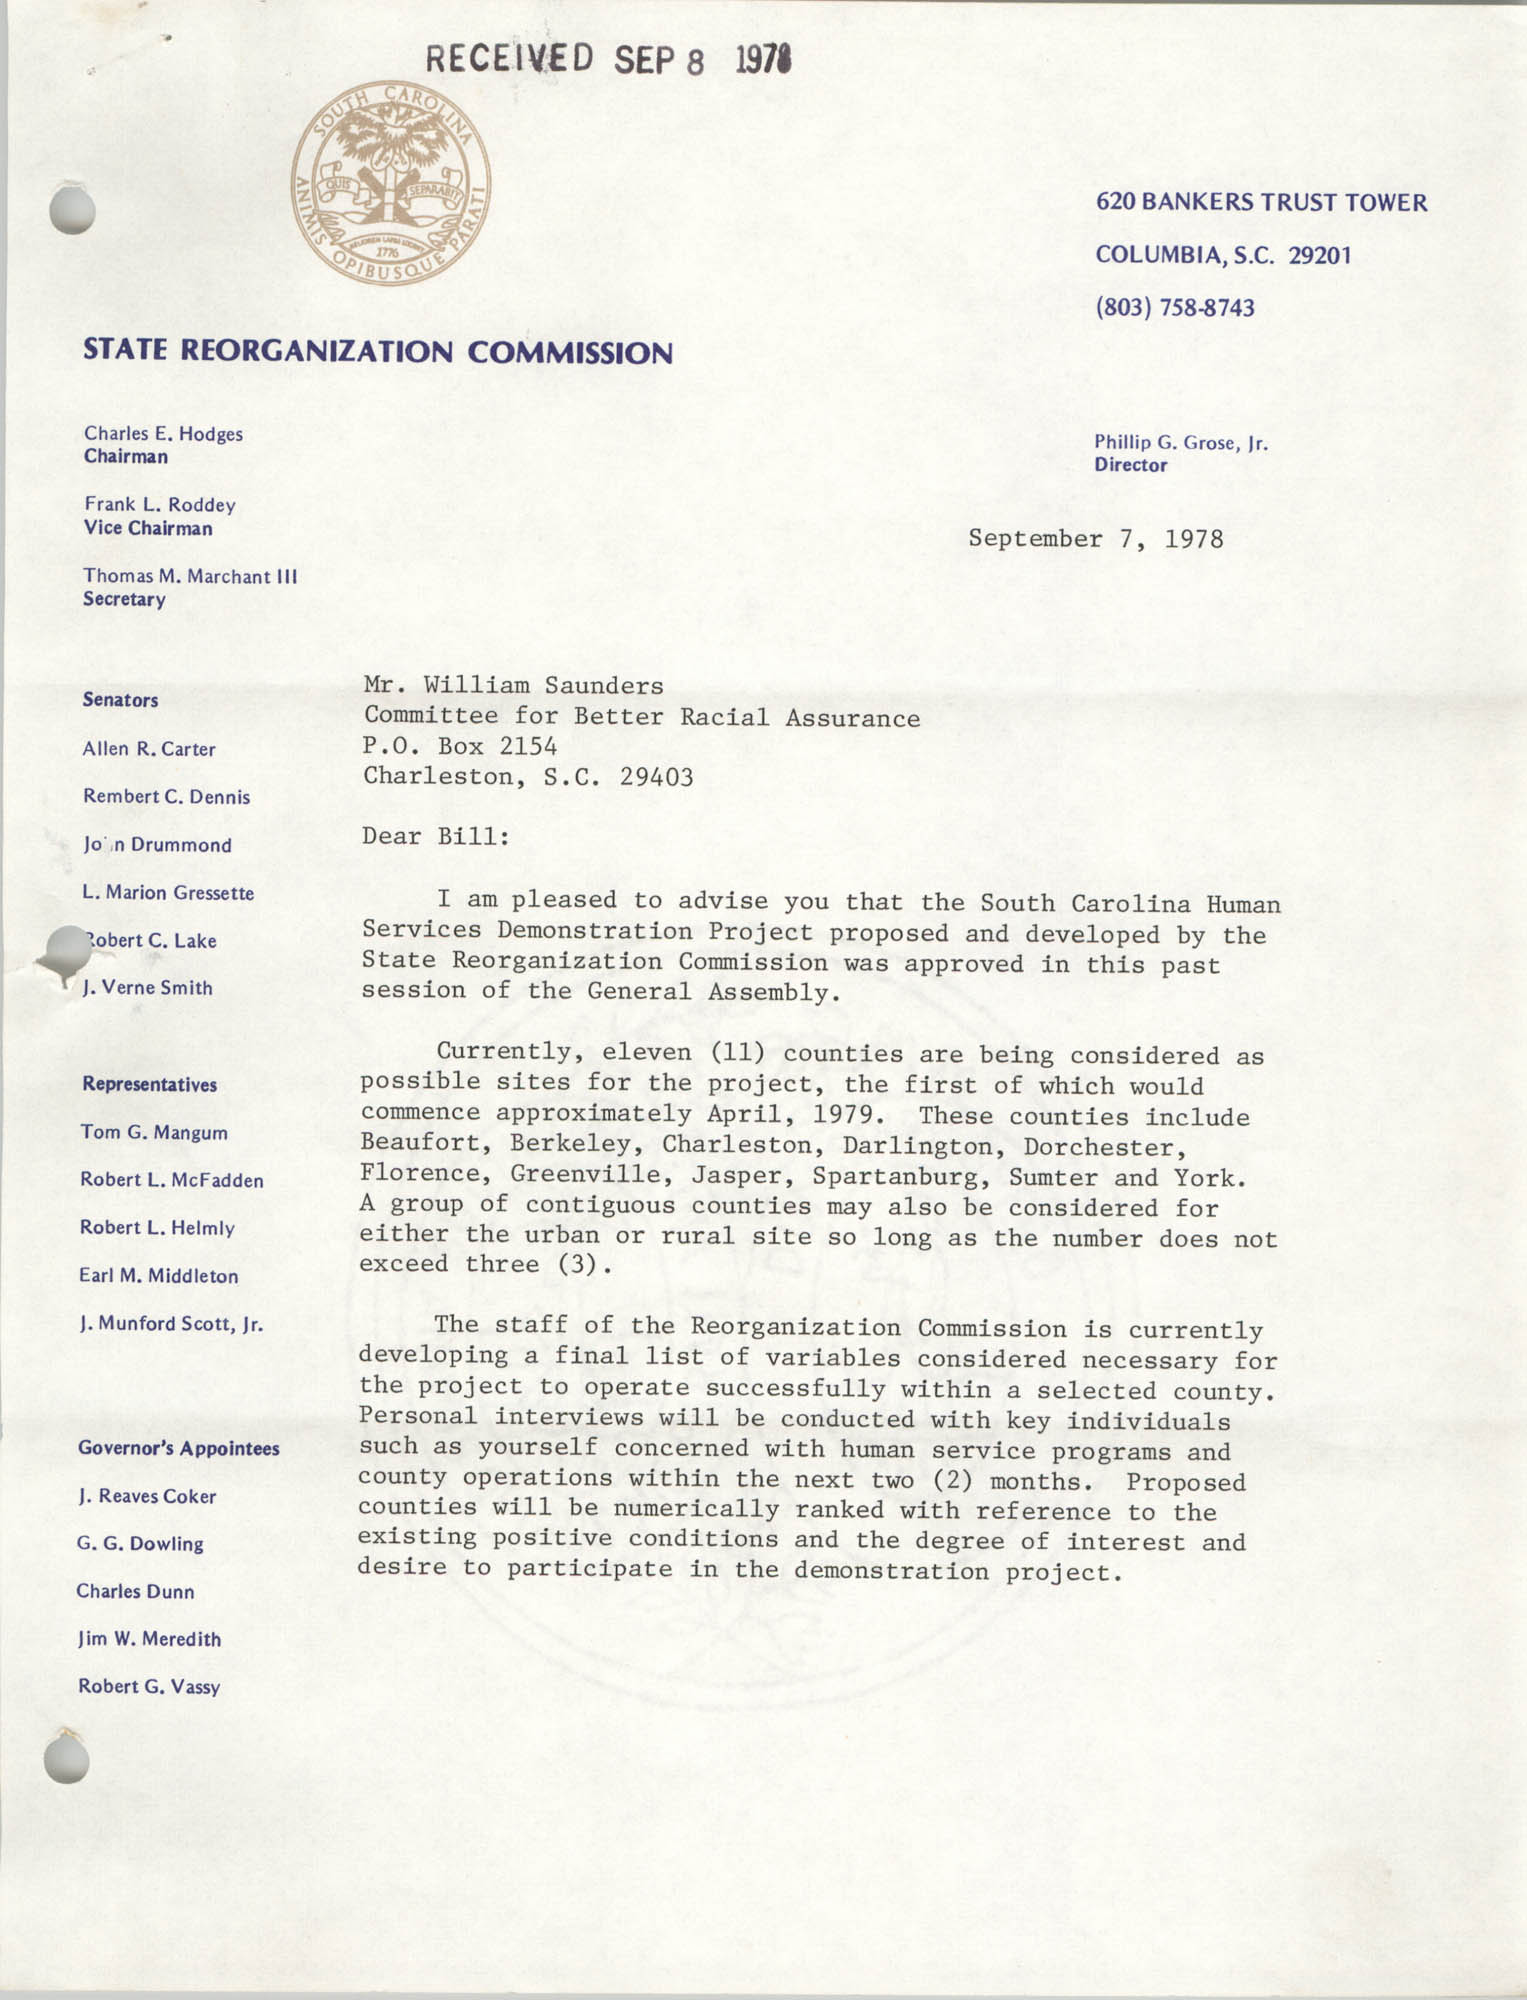 South Carolina Human Services Demonstration Project, July 24, 1978